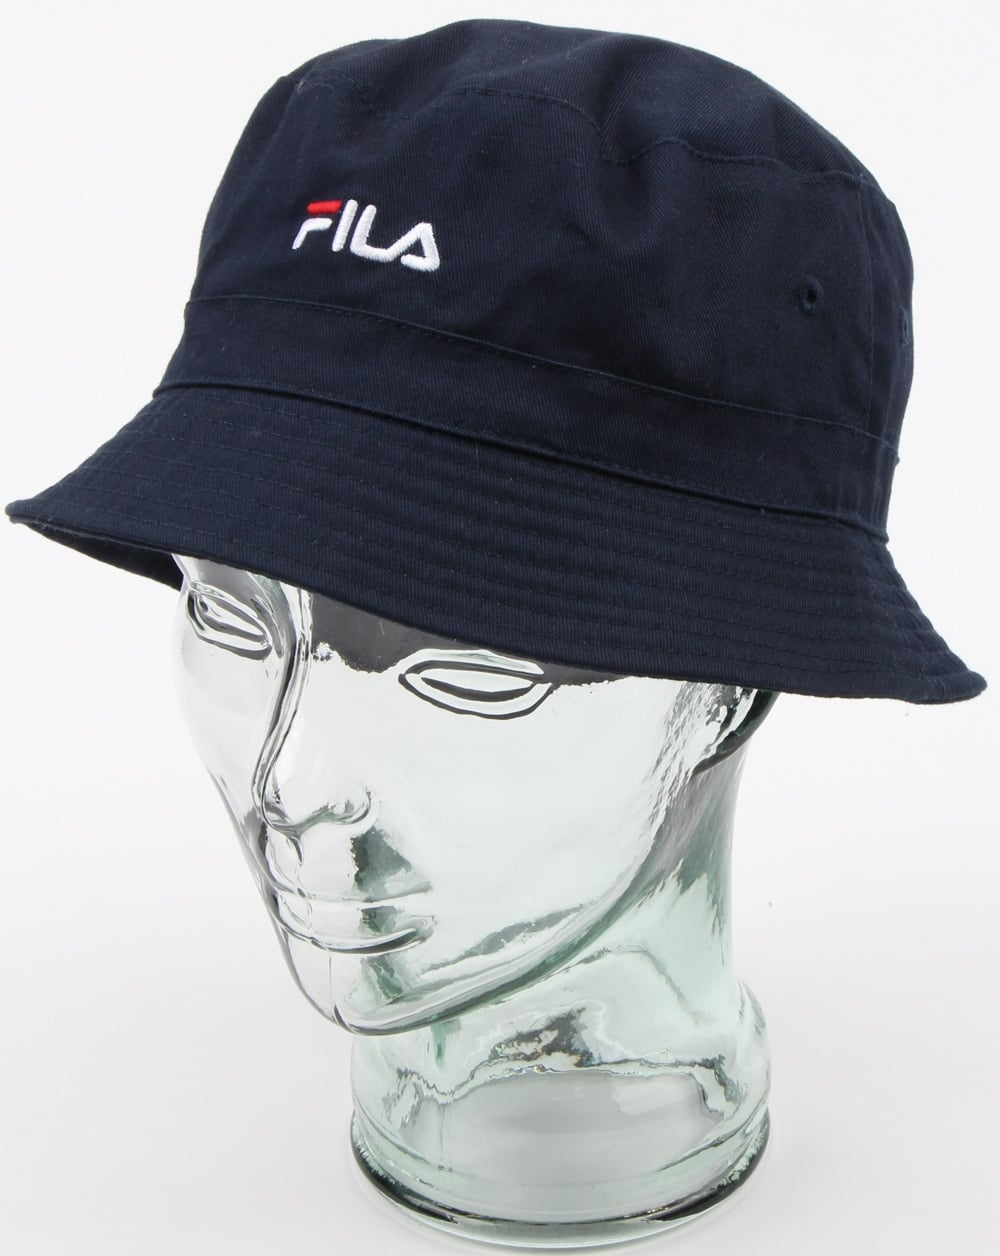 Fila Vintage Baxter Bucket Hat Navy